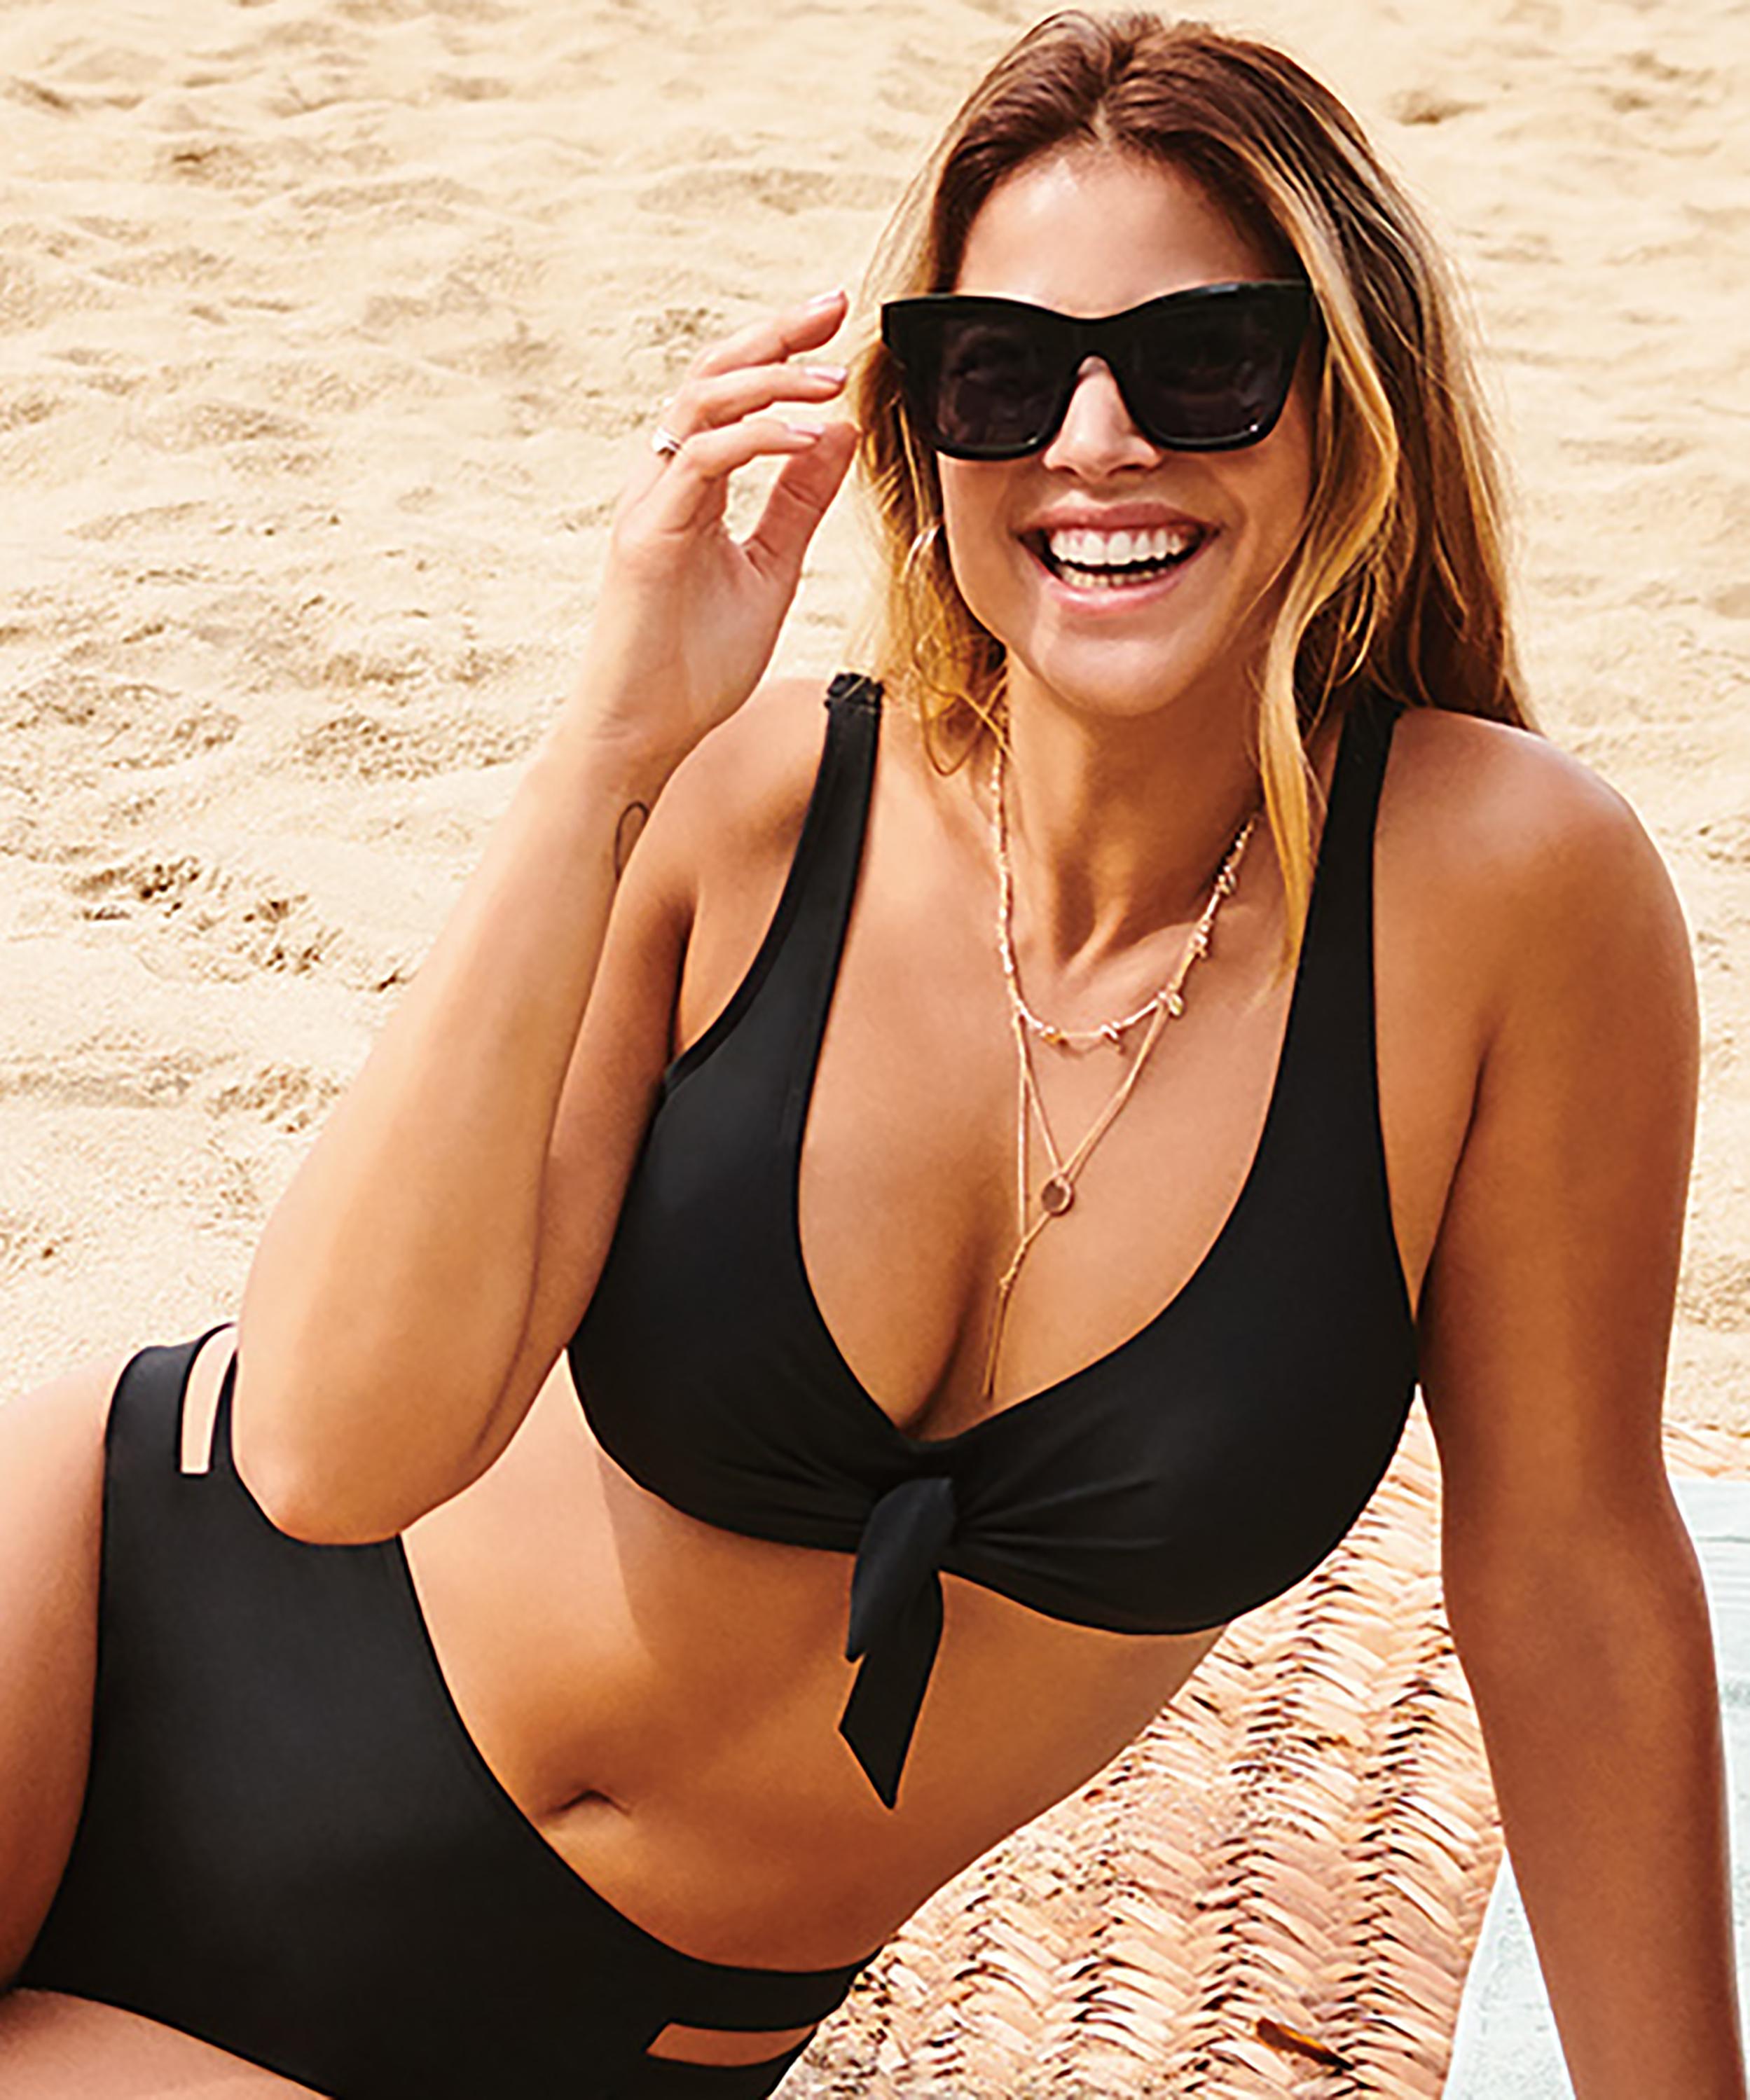 Anneau non ajusté haut de bikini Sunset Dreams, Noir, main